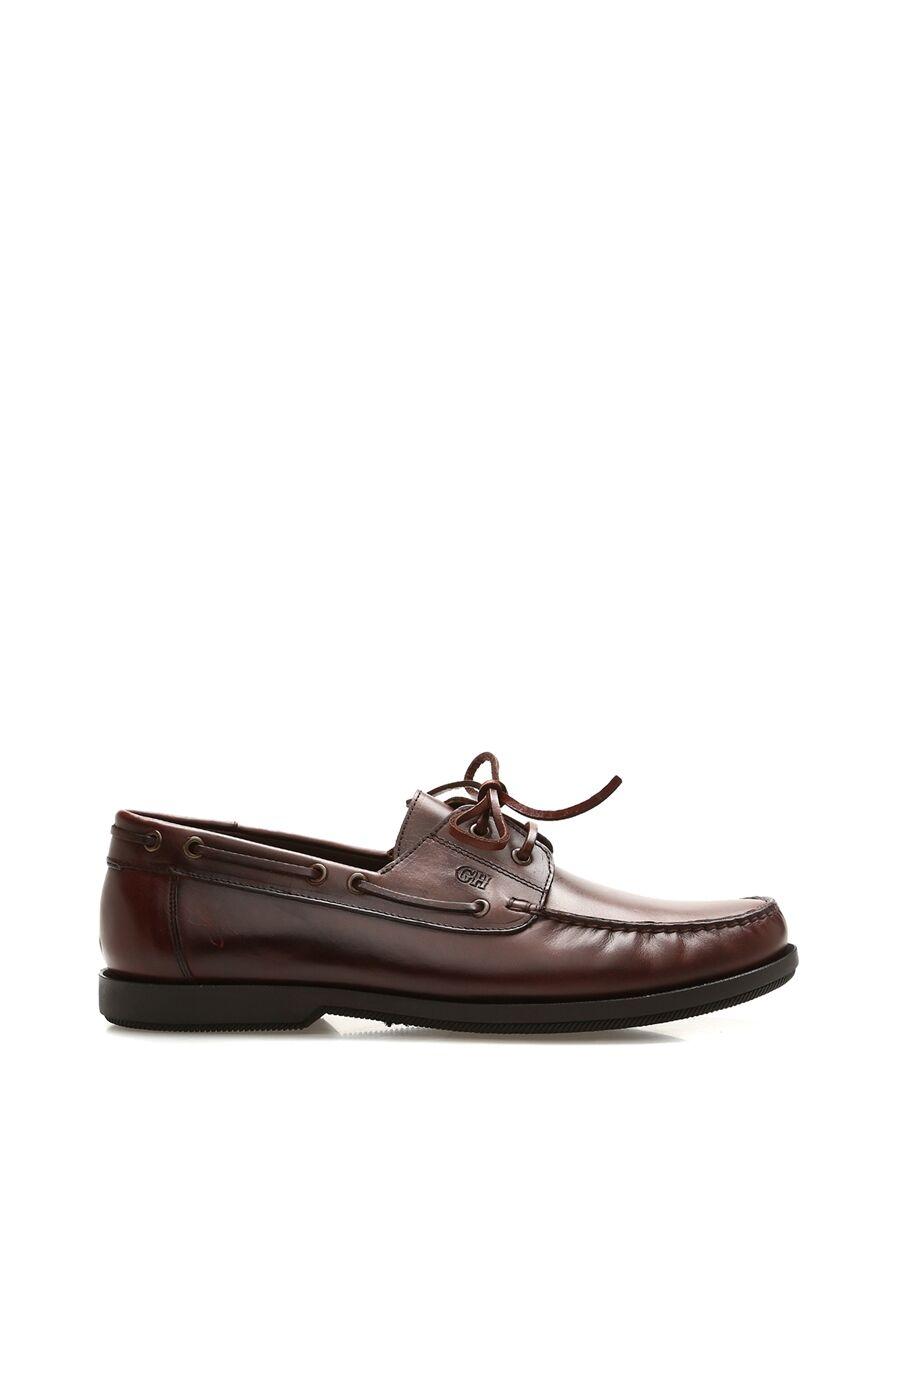 George Hogg Kahverengi Loafer – 597.0 TL